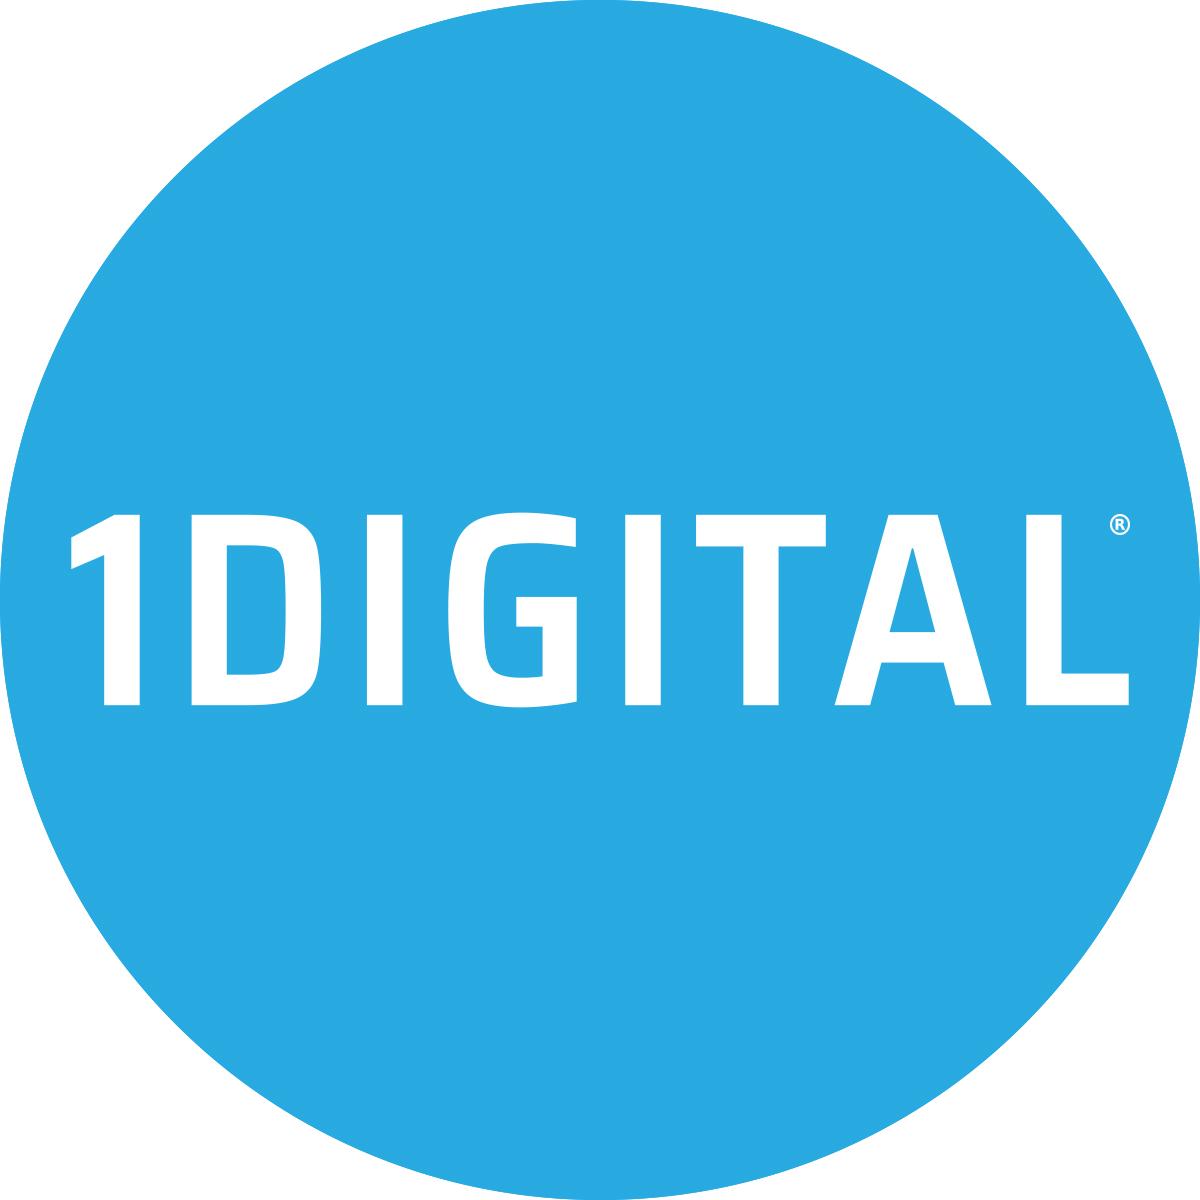 1 Digital Agency